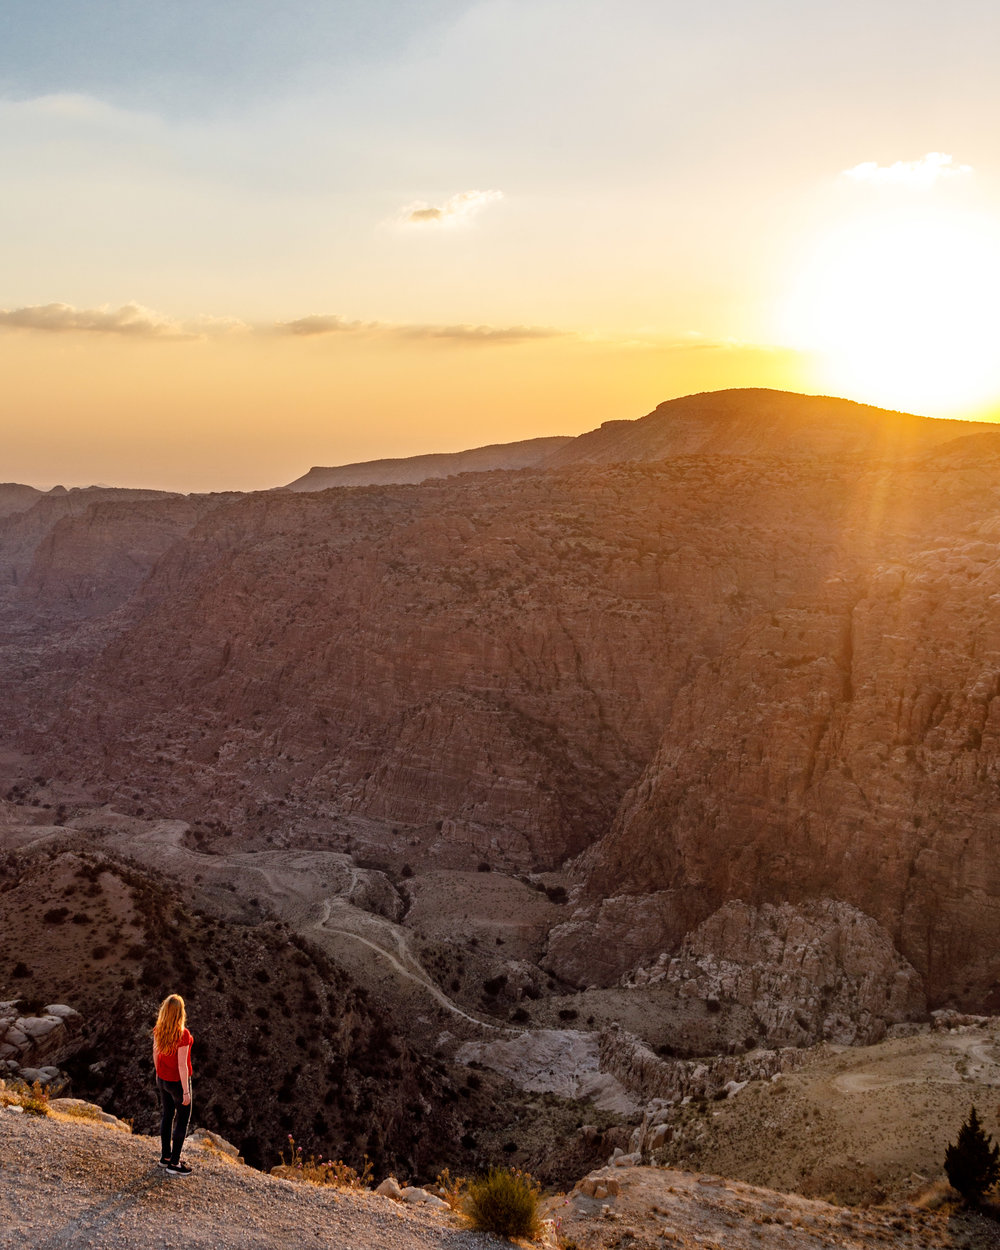 Instagrammable Jordan - Wadi Dana